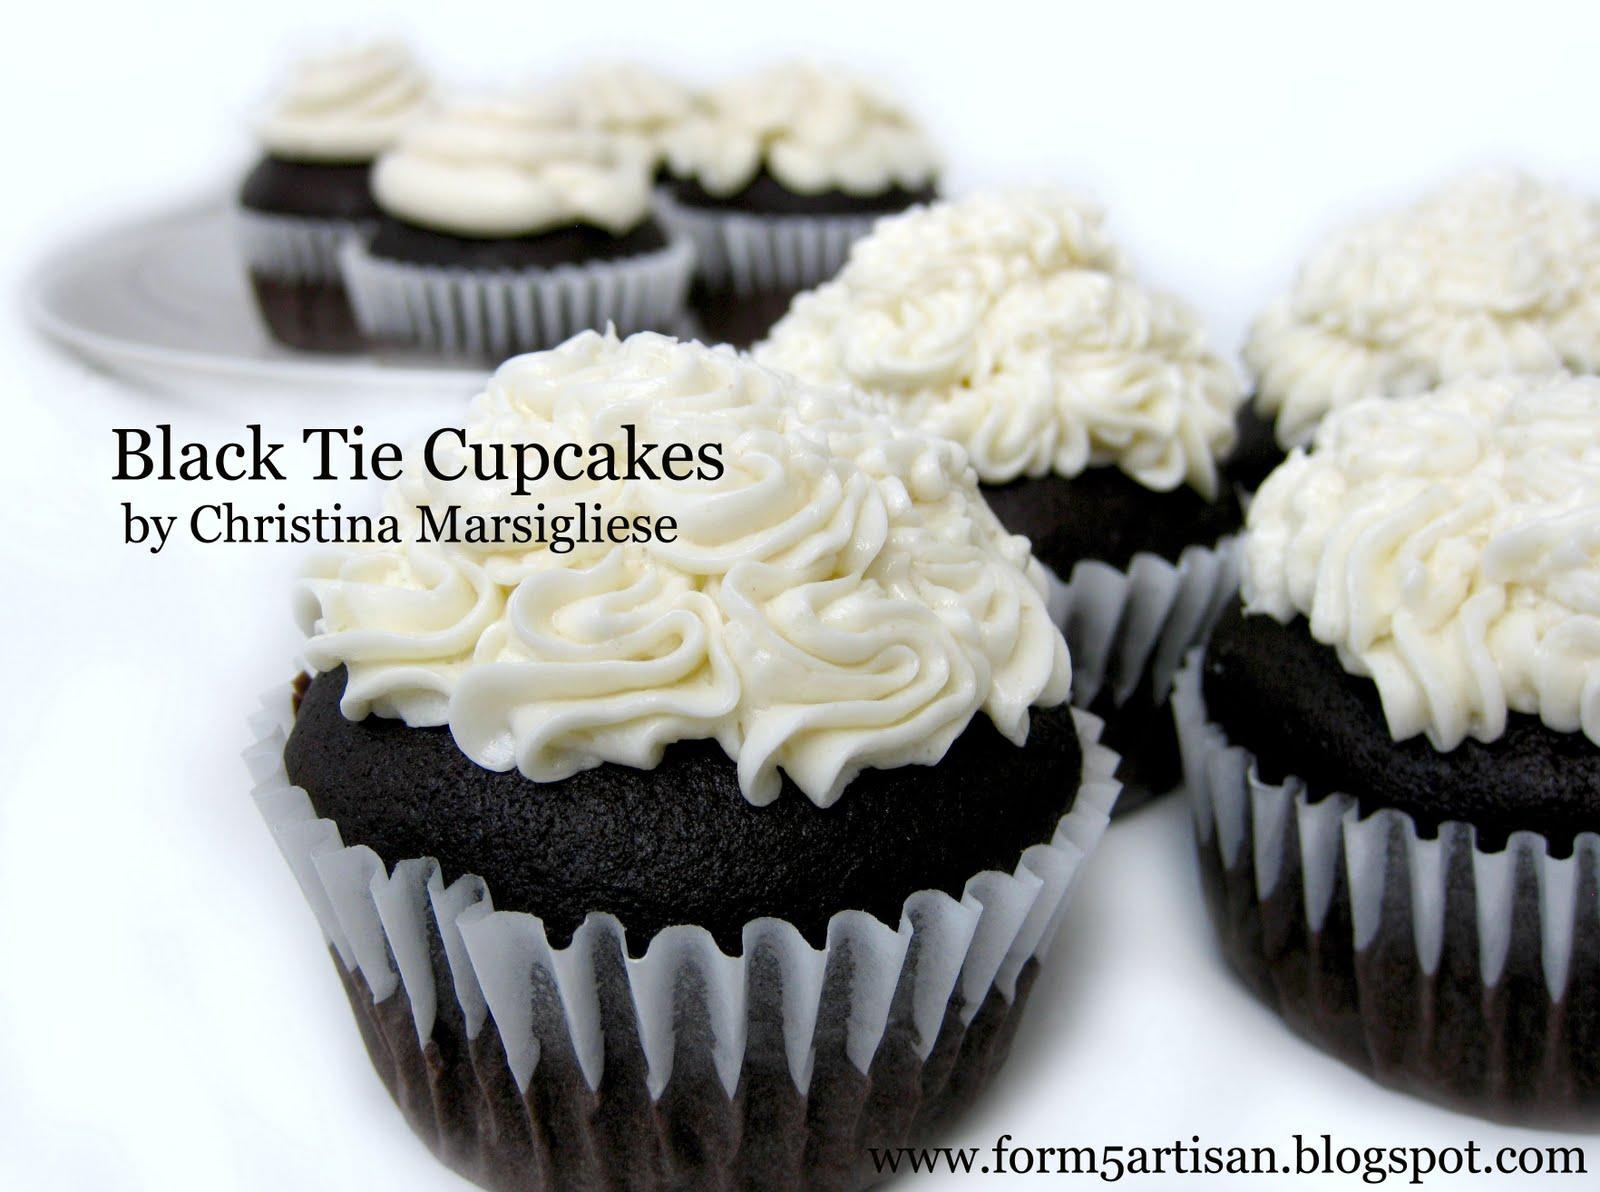 Scientifically Sweet: Black Tie Cupcakes